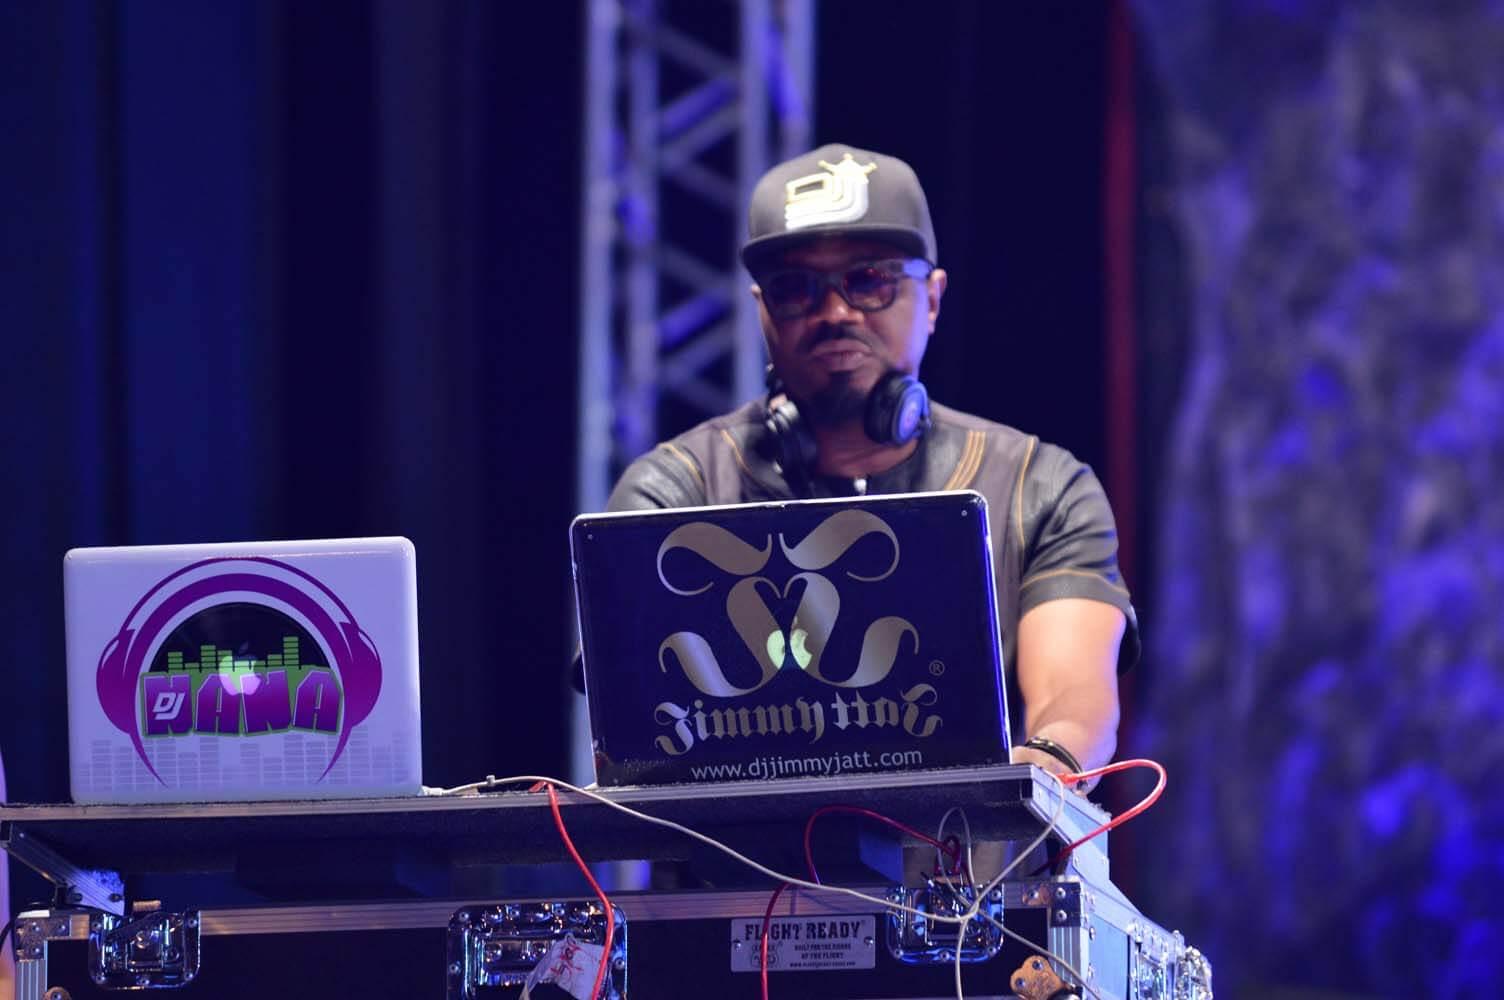 digital-lagos-party-today-features-dj-jimmy-jatt